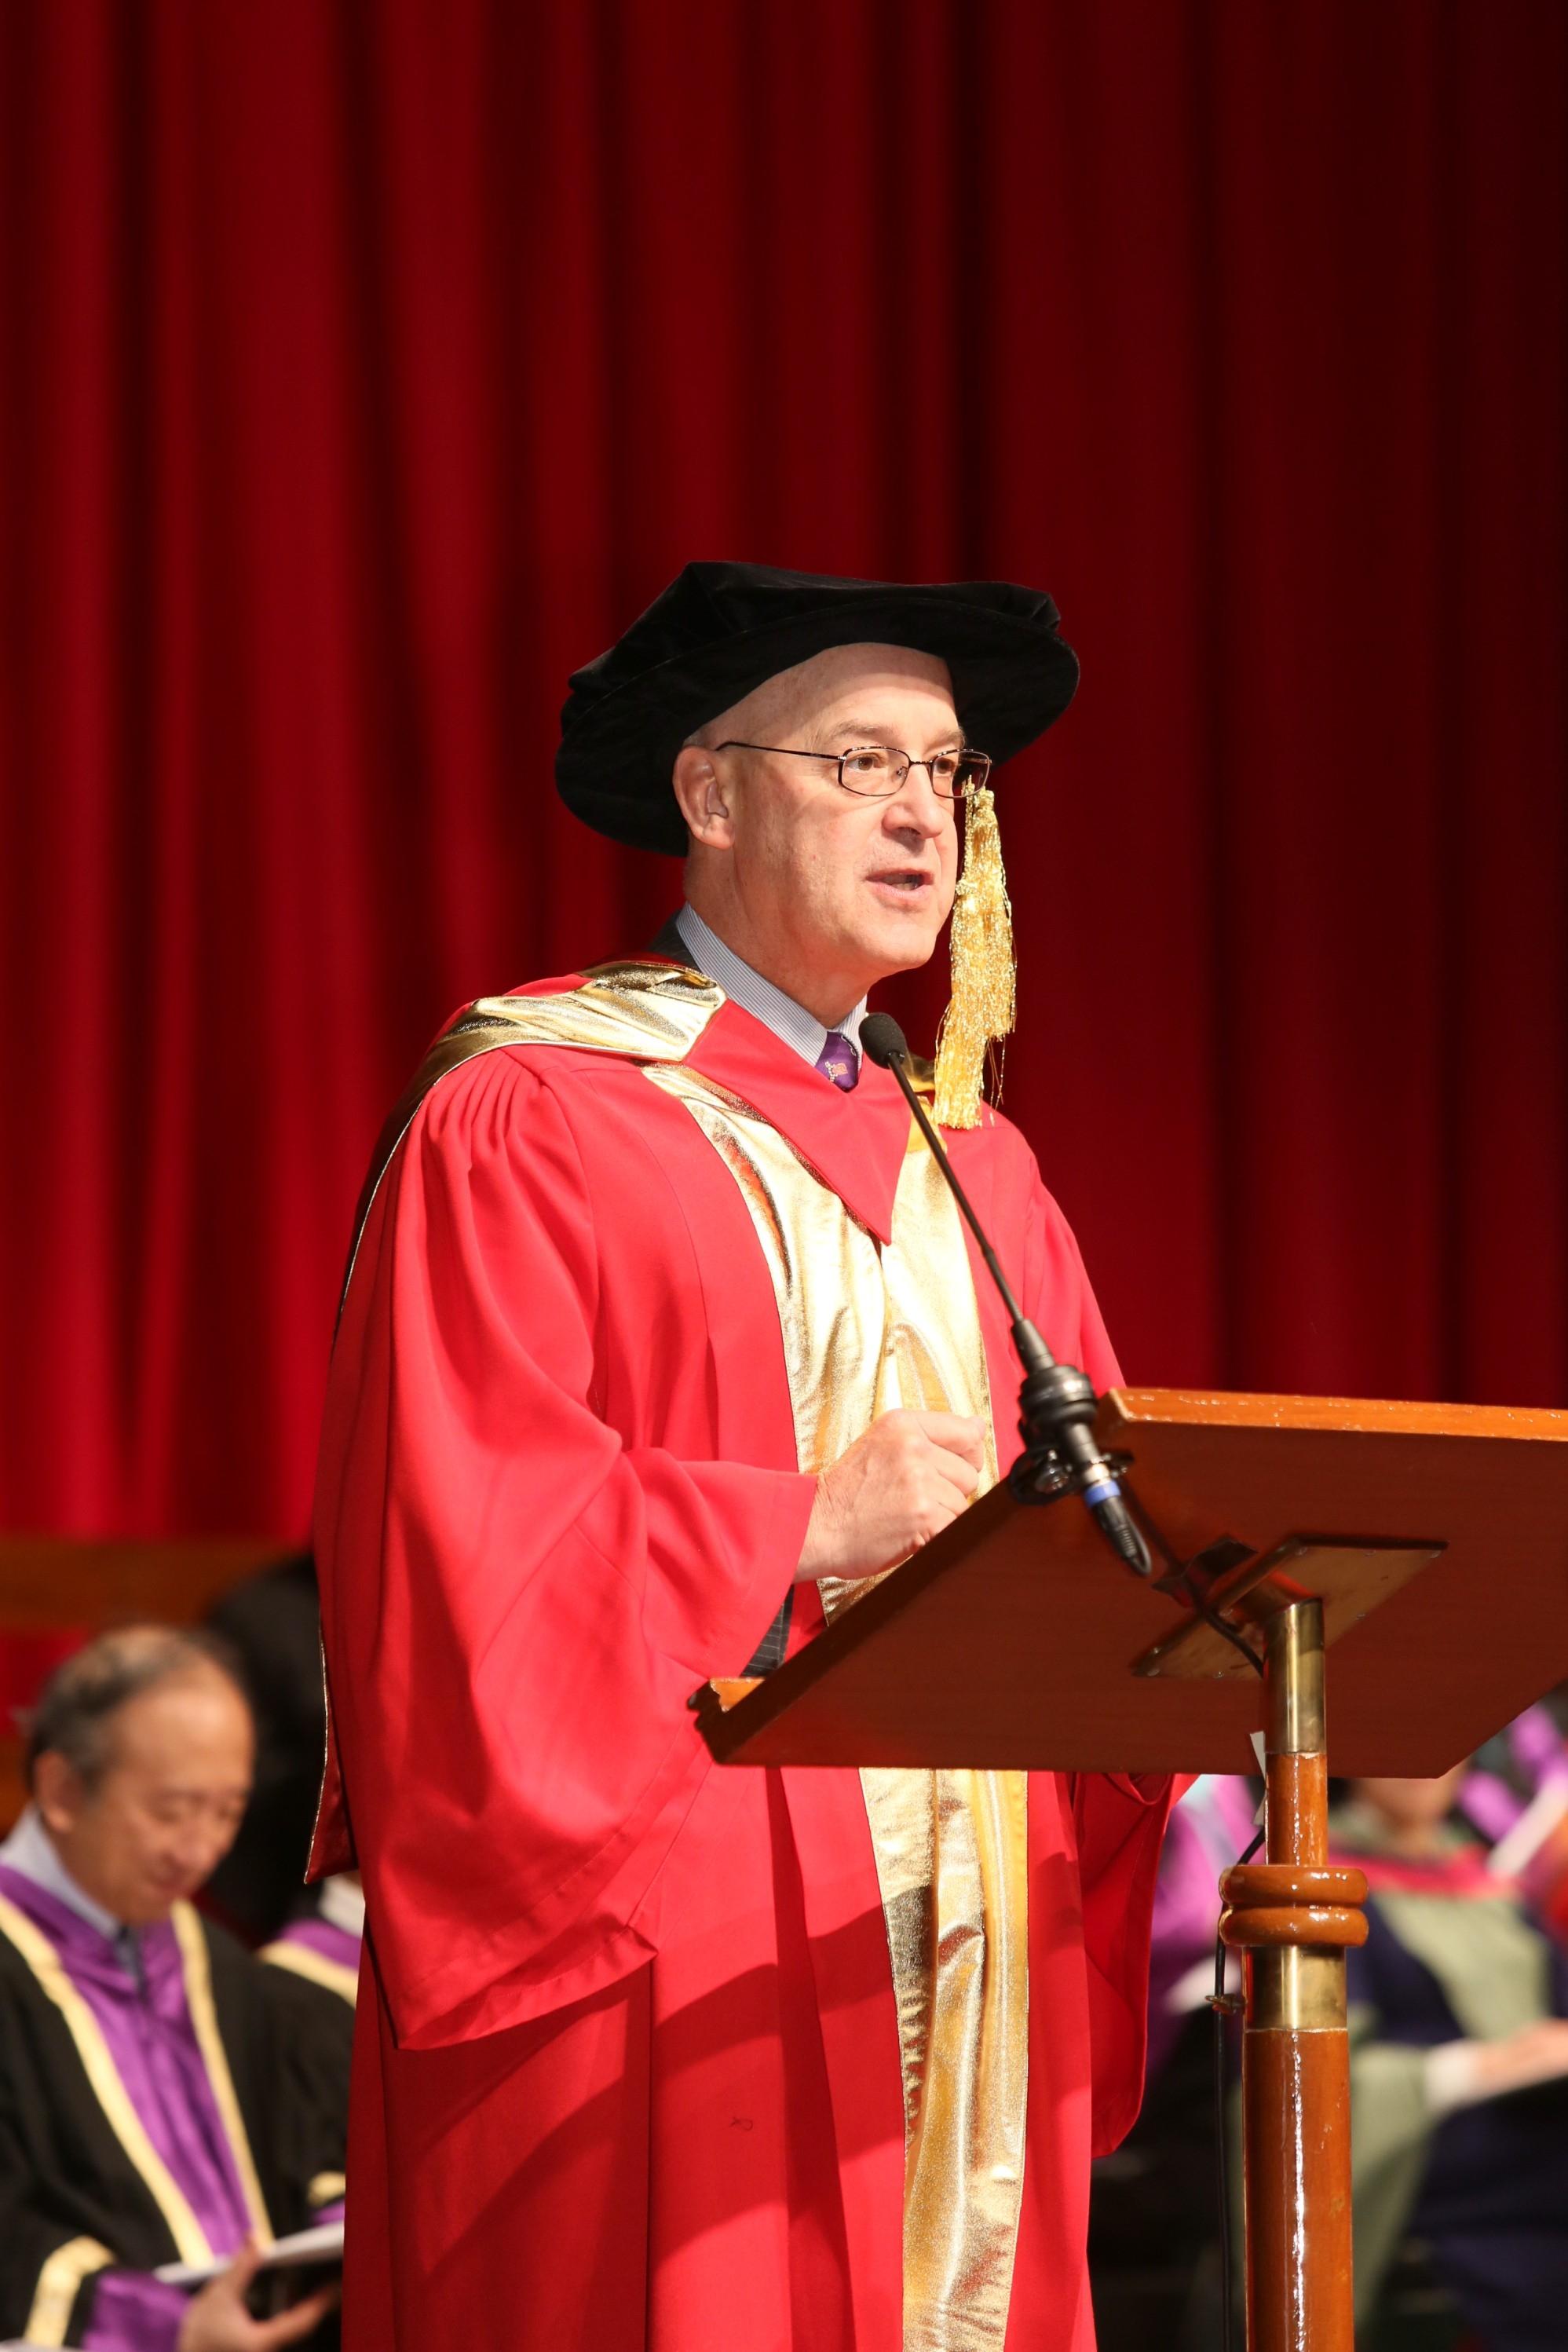 Prof. Andrew D. Hamilton delivers a speech